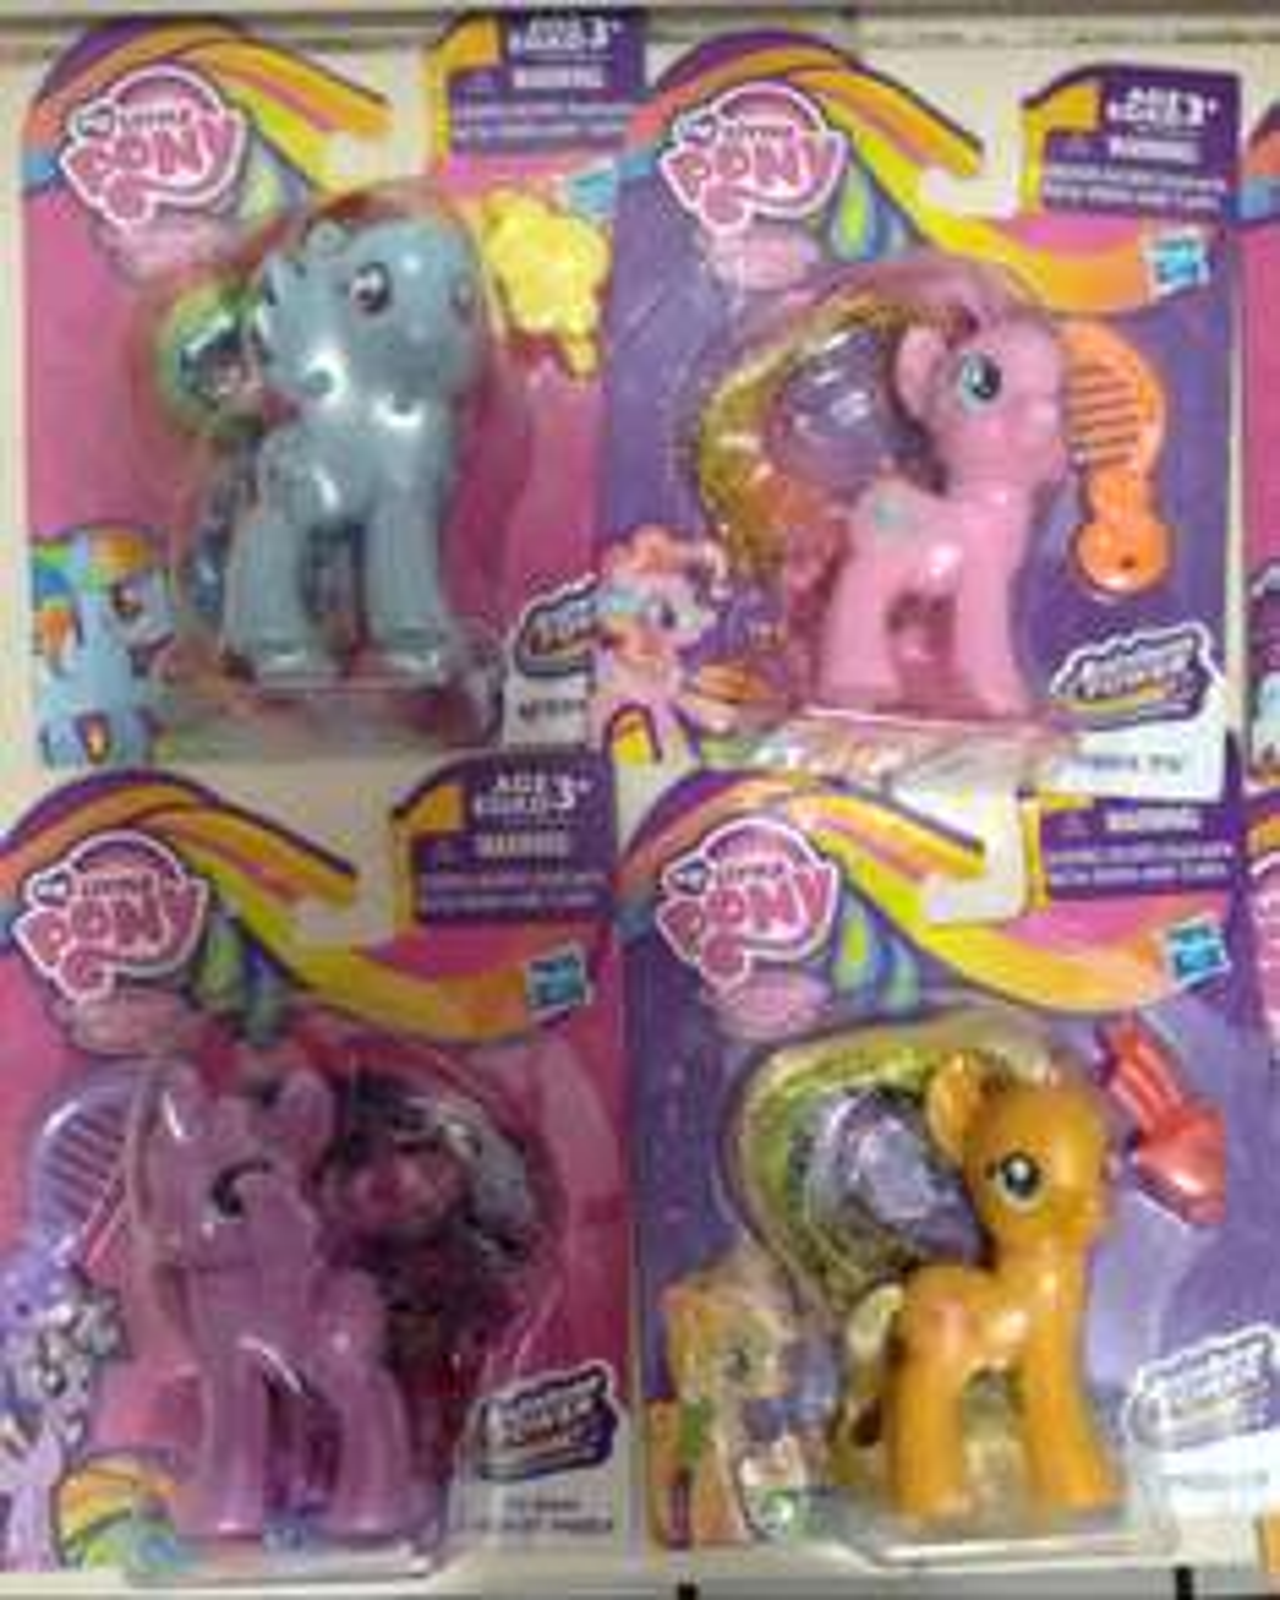 Bodega Aurrerá: Figuras Hasbro My Little Pony $8.02